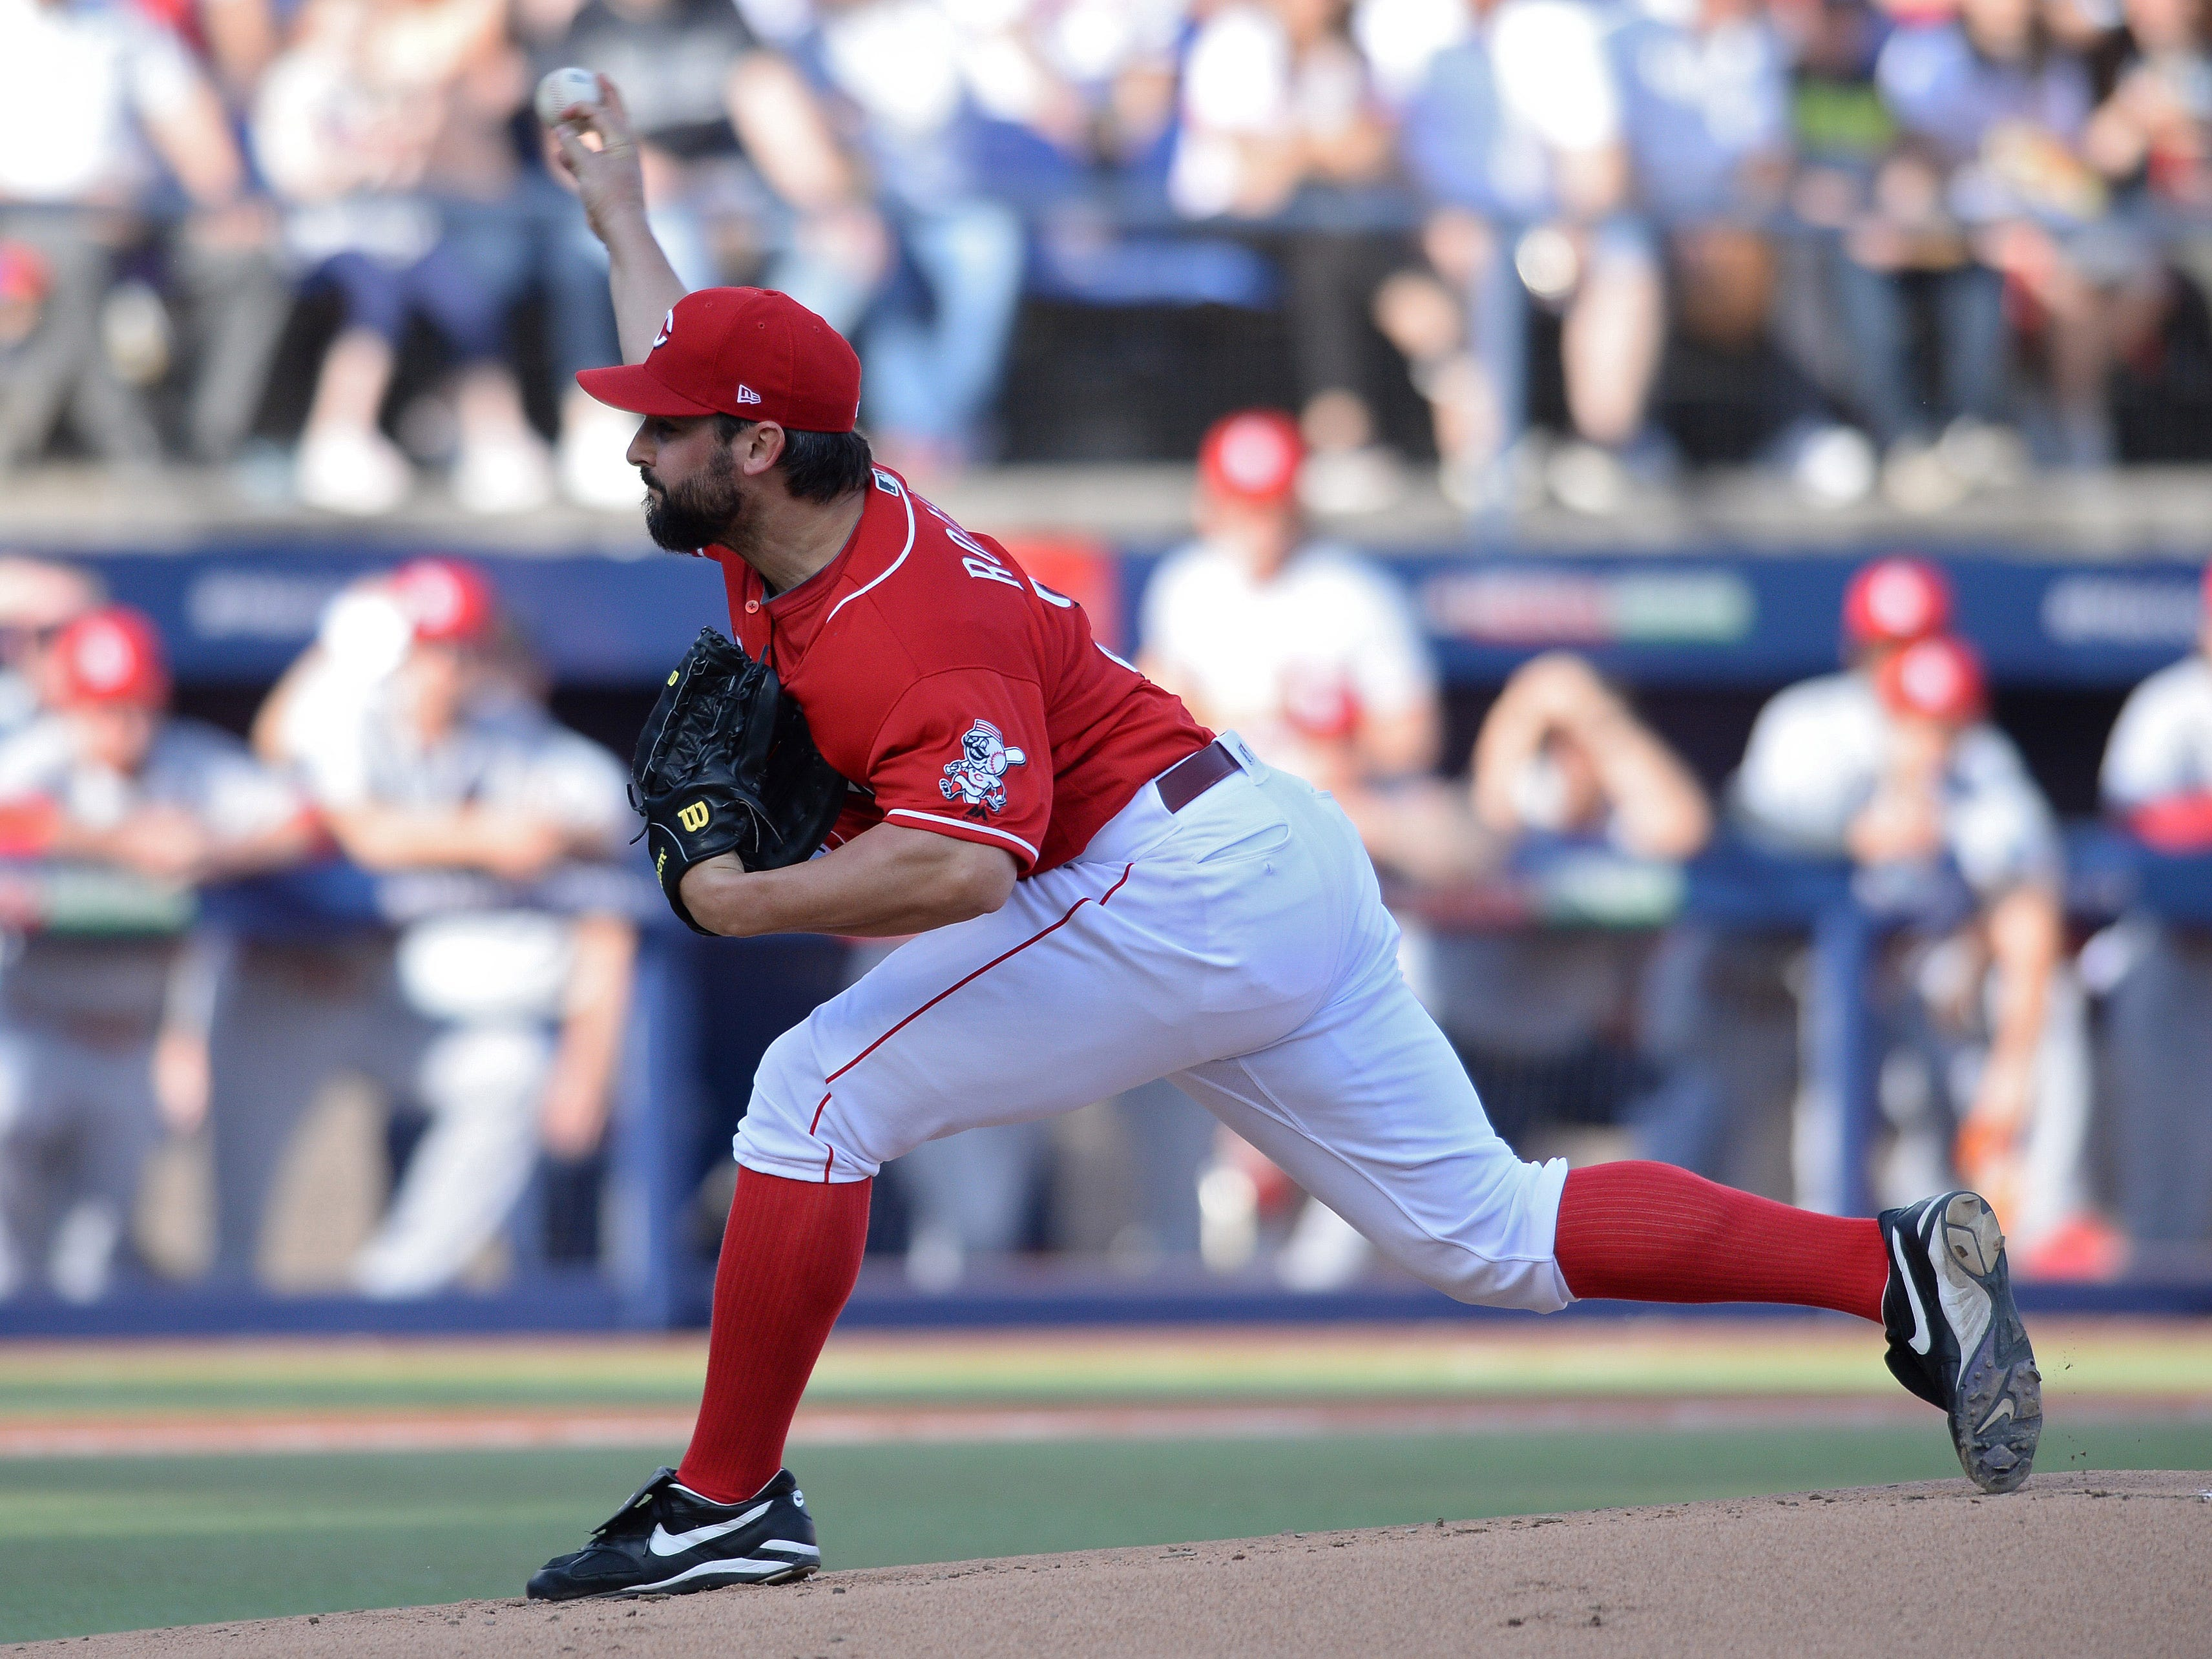 Cincinnati Reds starting pitcher Tanner Roark works against a St. Louis Cardinals batter during the first inning at Estadio de Beisbol Monterrey.